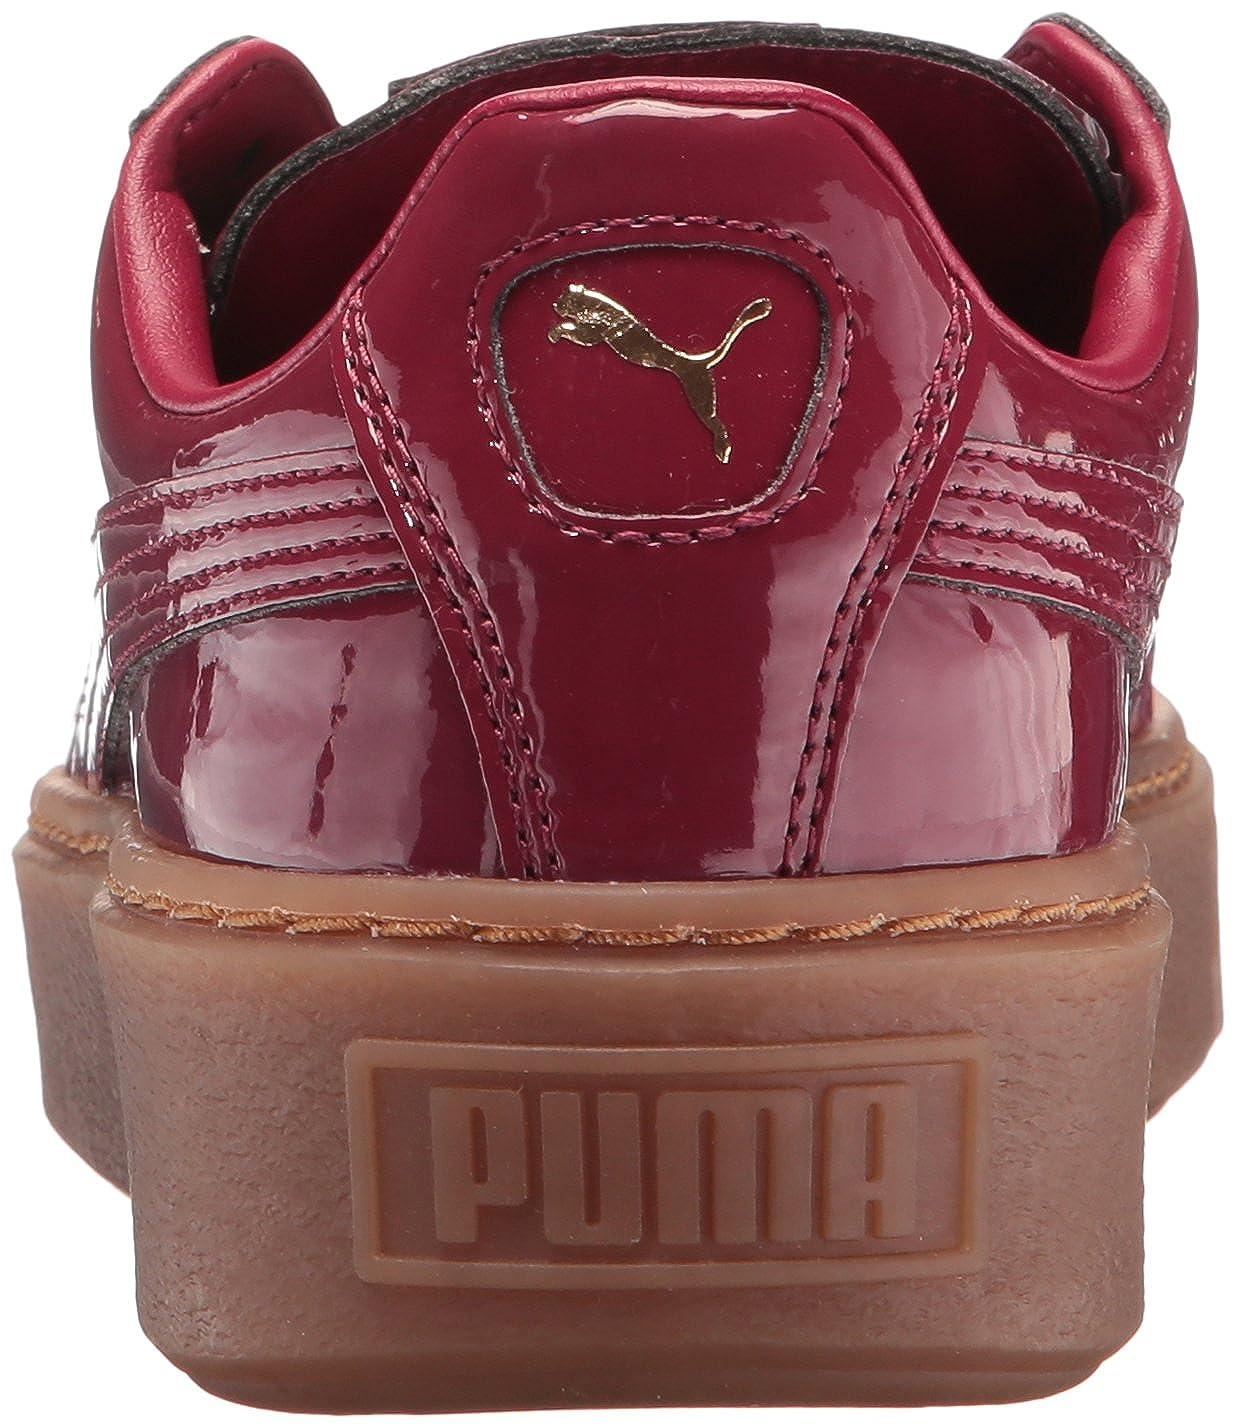 Puma Puma Puma Woherren Basket Platform Patent Wn's Field Hockey schuhe a336b5